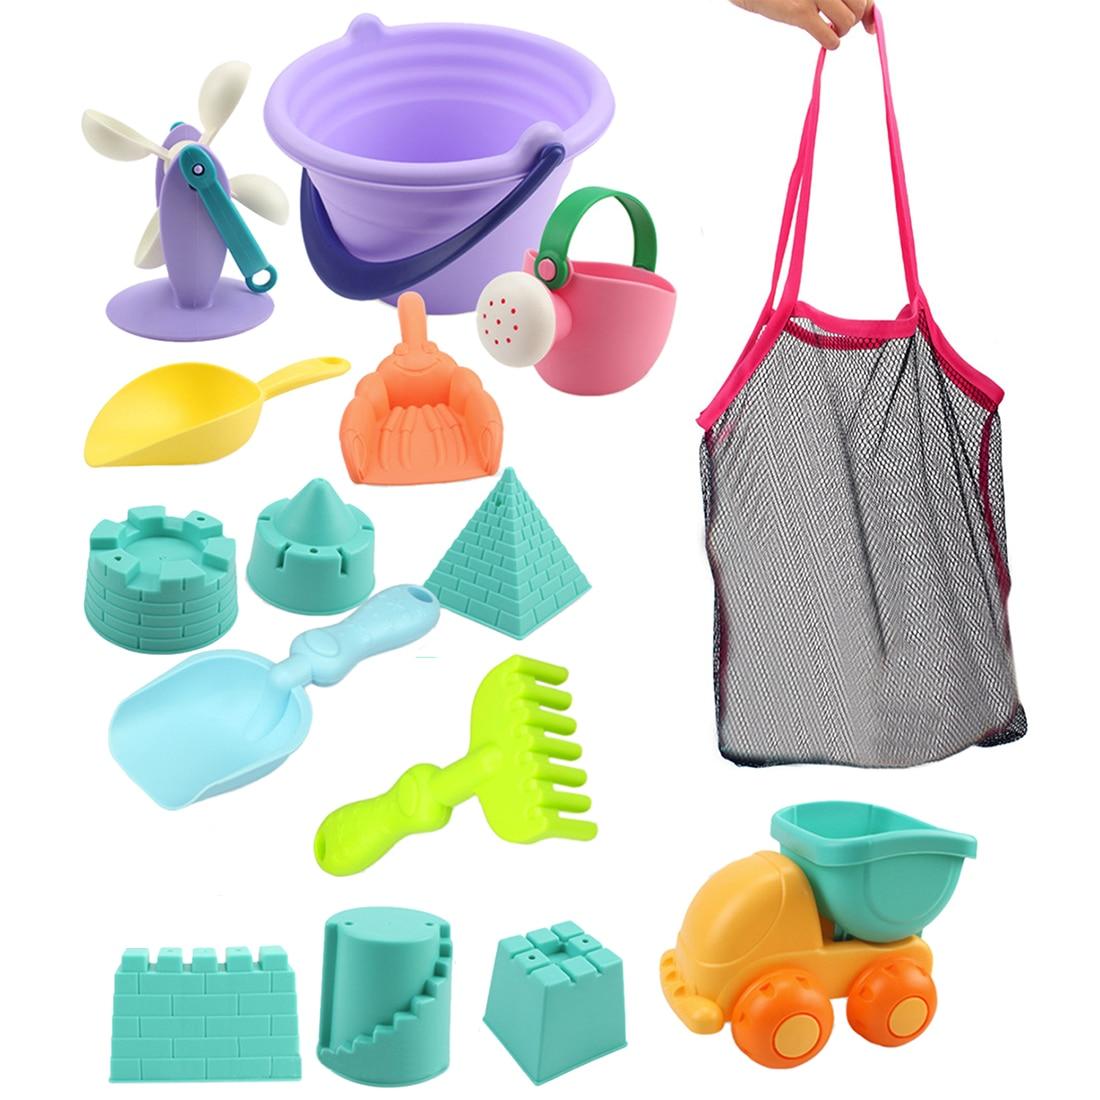 Hot 15Pcs/set Beach Sand Toys Soft Rubber Beach Bucket Playset Fun Toys Gift for Kids Summer Outdoor Fun Drop Ship -Random Color